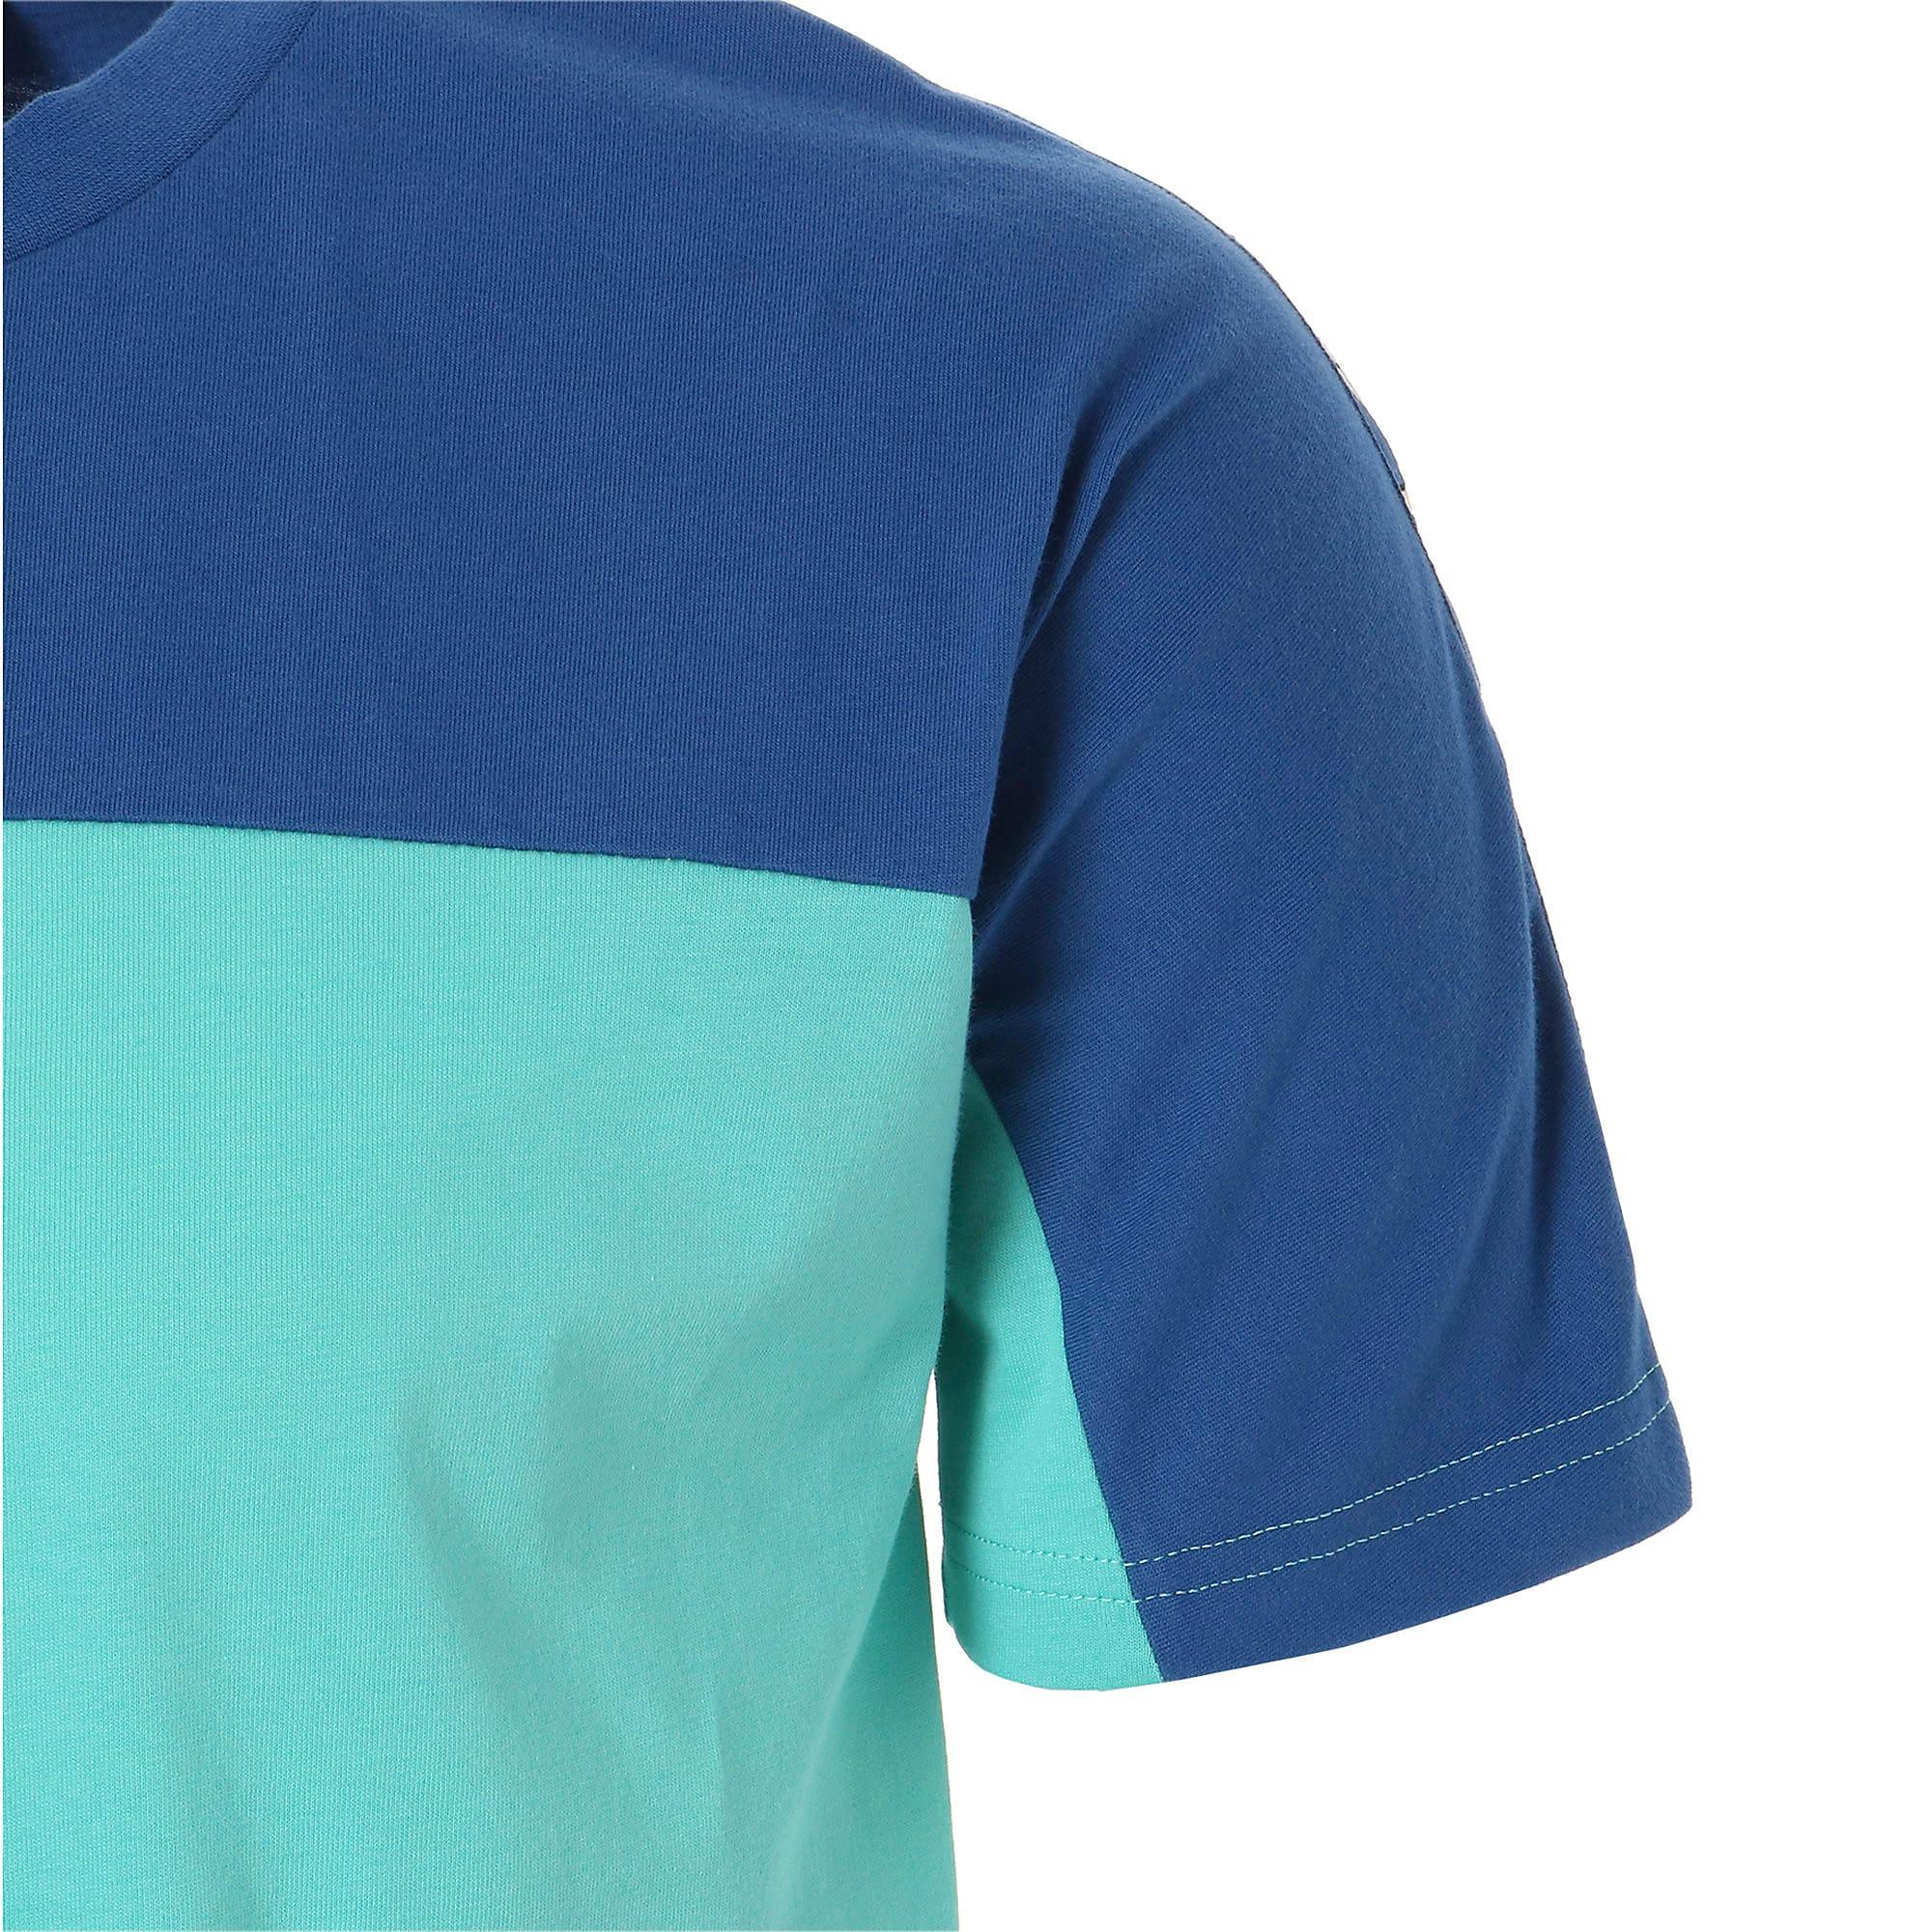 Thumbnail 7 of PUMA XTG SS Tシャツ 半袖, Blue Turquoise, medium-JPN